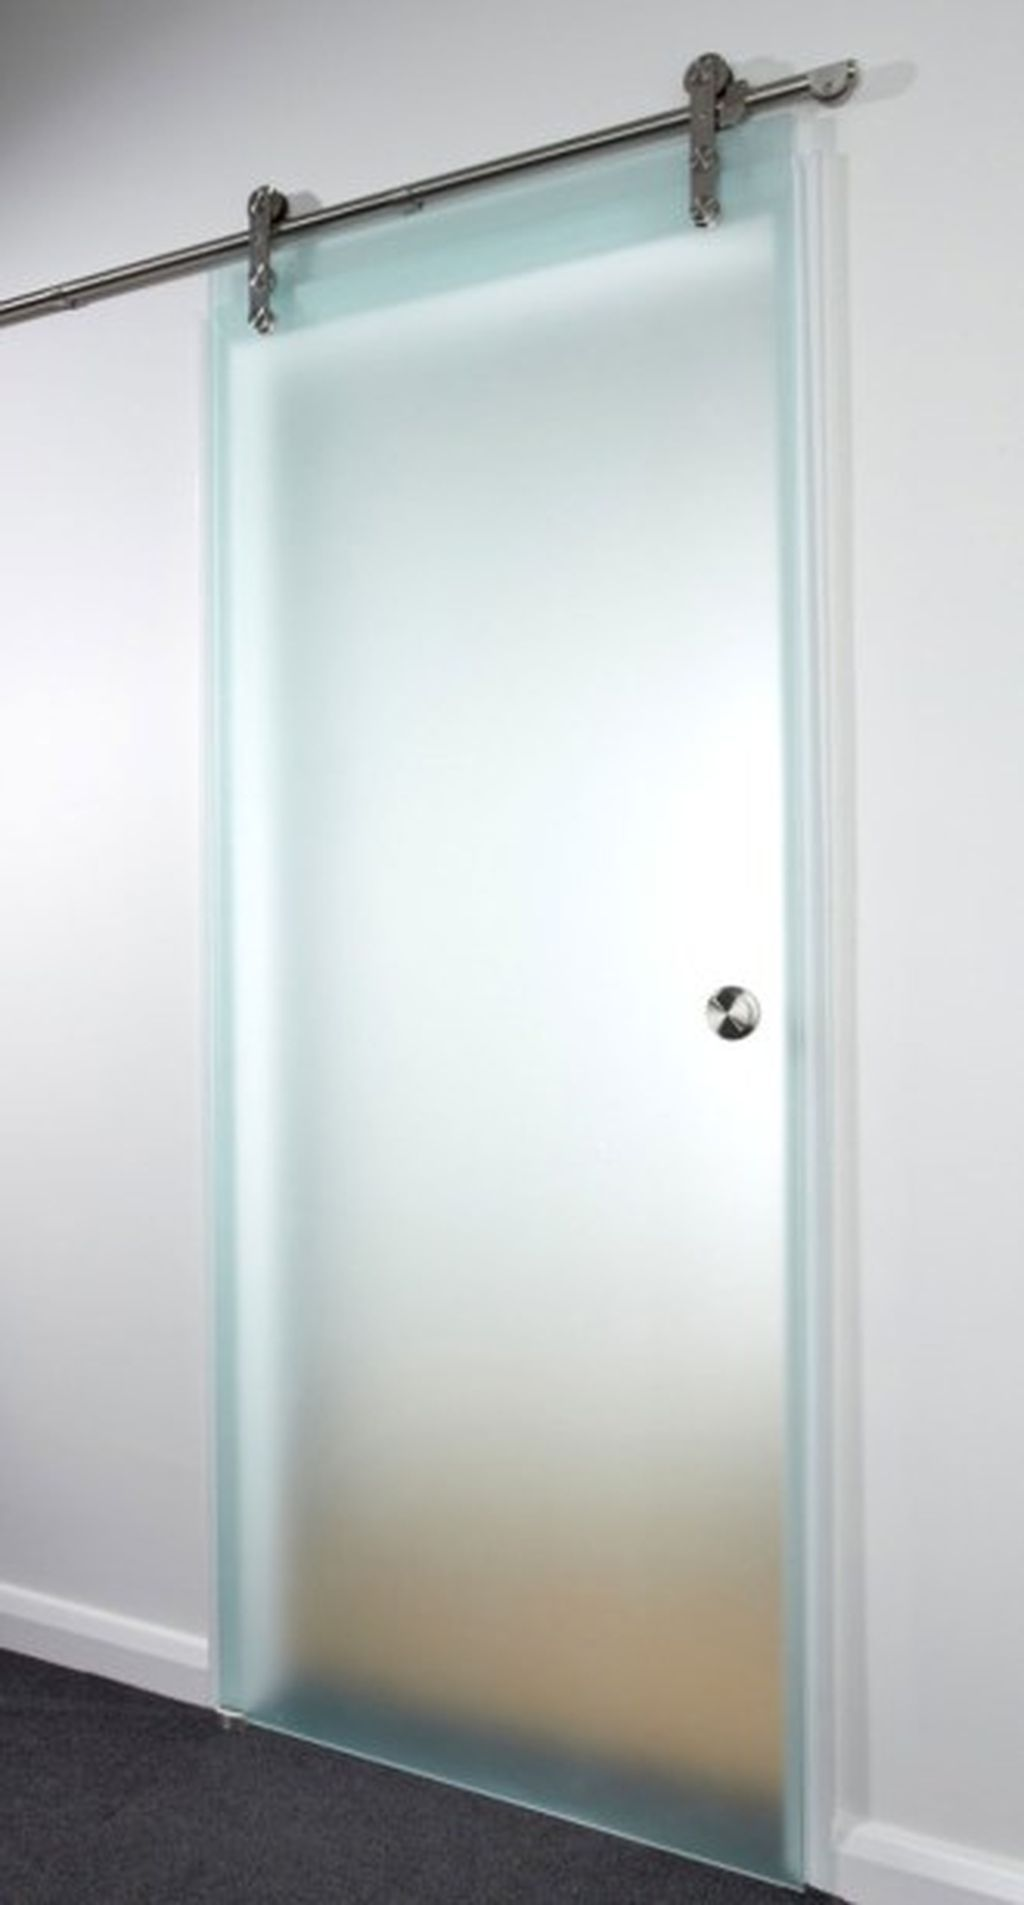 Awesome 20 Modern Glass Sliding Door Designs Ideas For Your Bathroom More At Http Trendhmdcr Com 20 Door Glass Design Barn Doors Sliding Sliding Glass Door